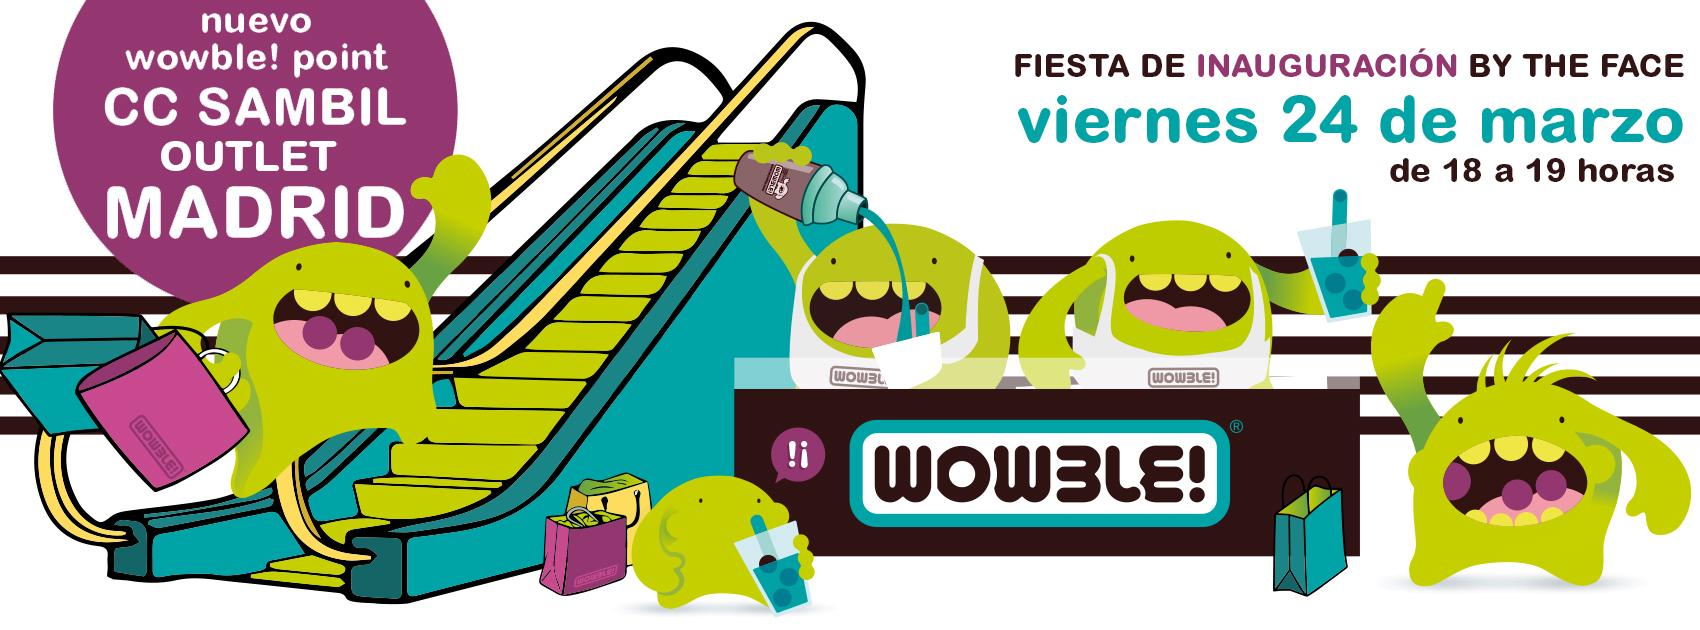 Bubble drink, la moda que llega al CC Sambil de Madrid